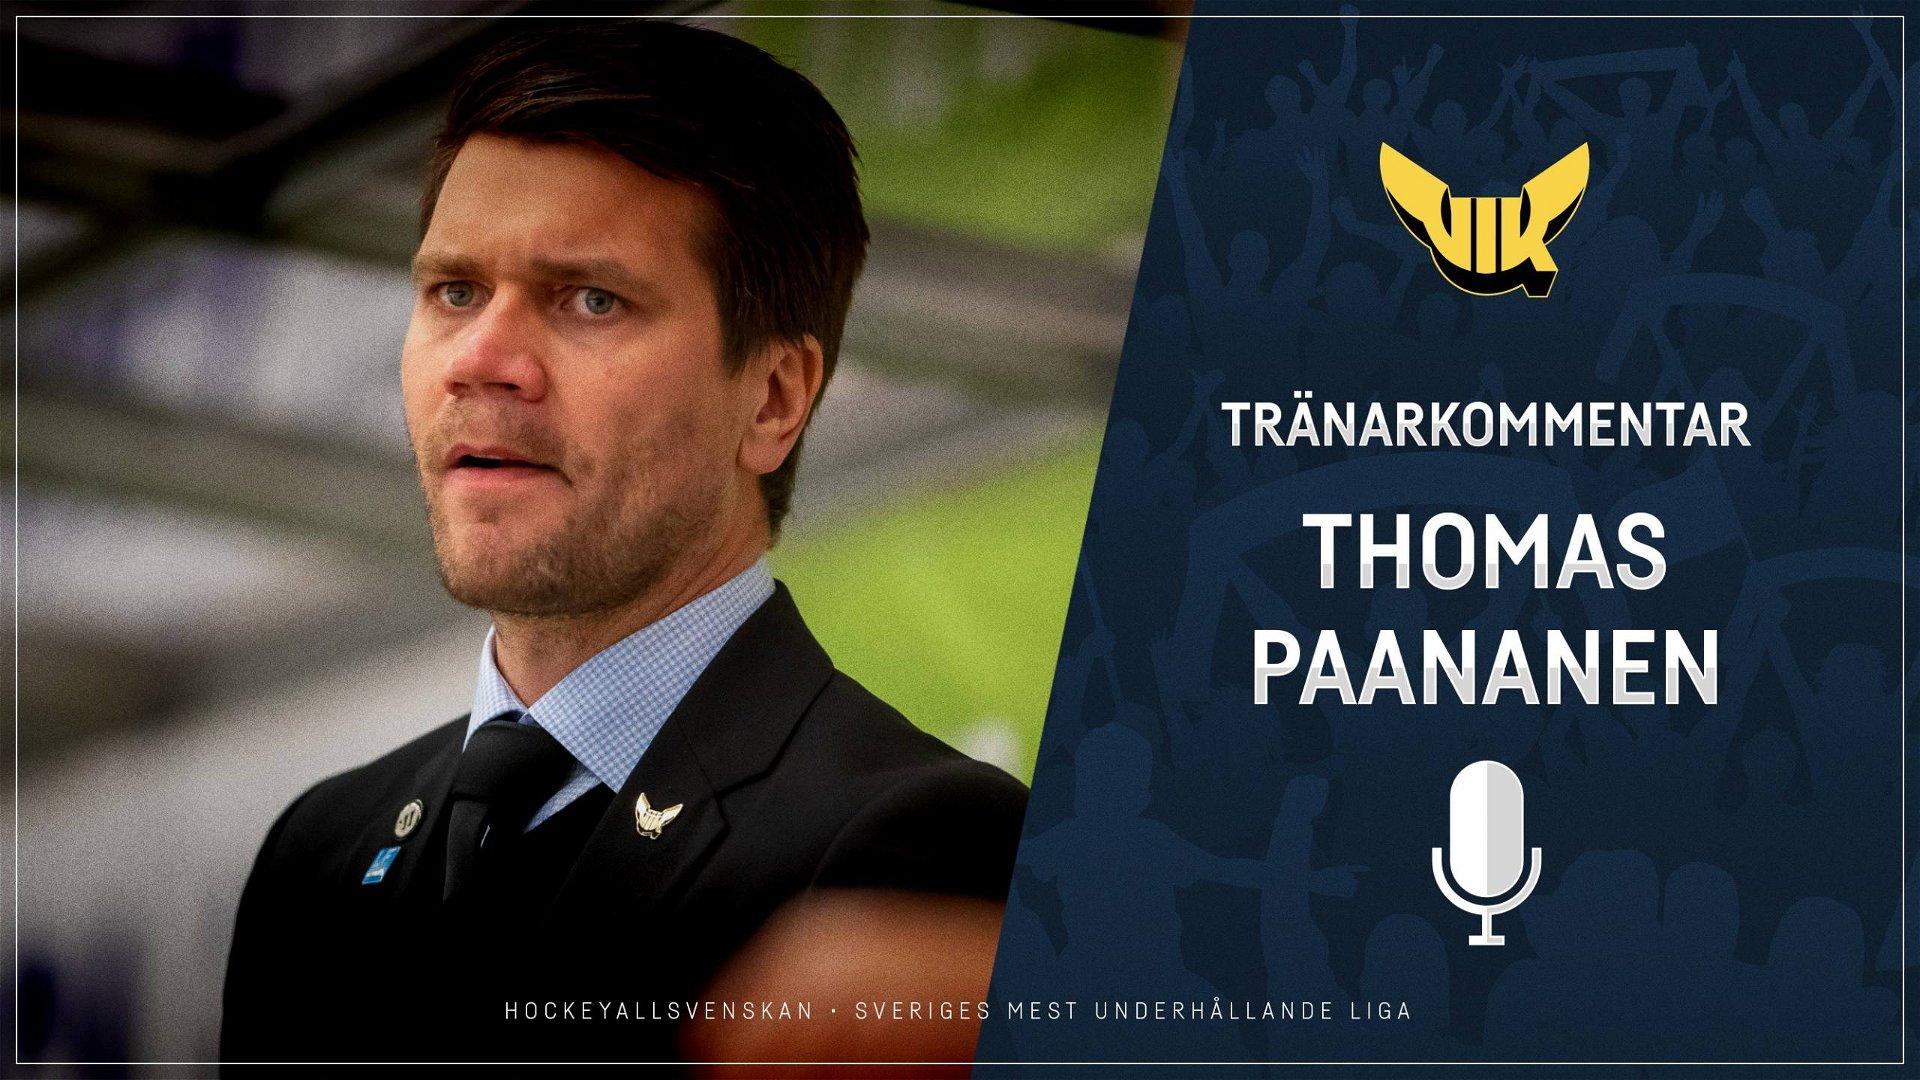 2021-02-28 Segerintervju: Thomas Paananen